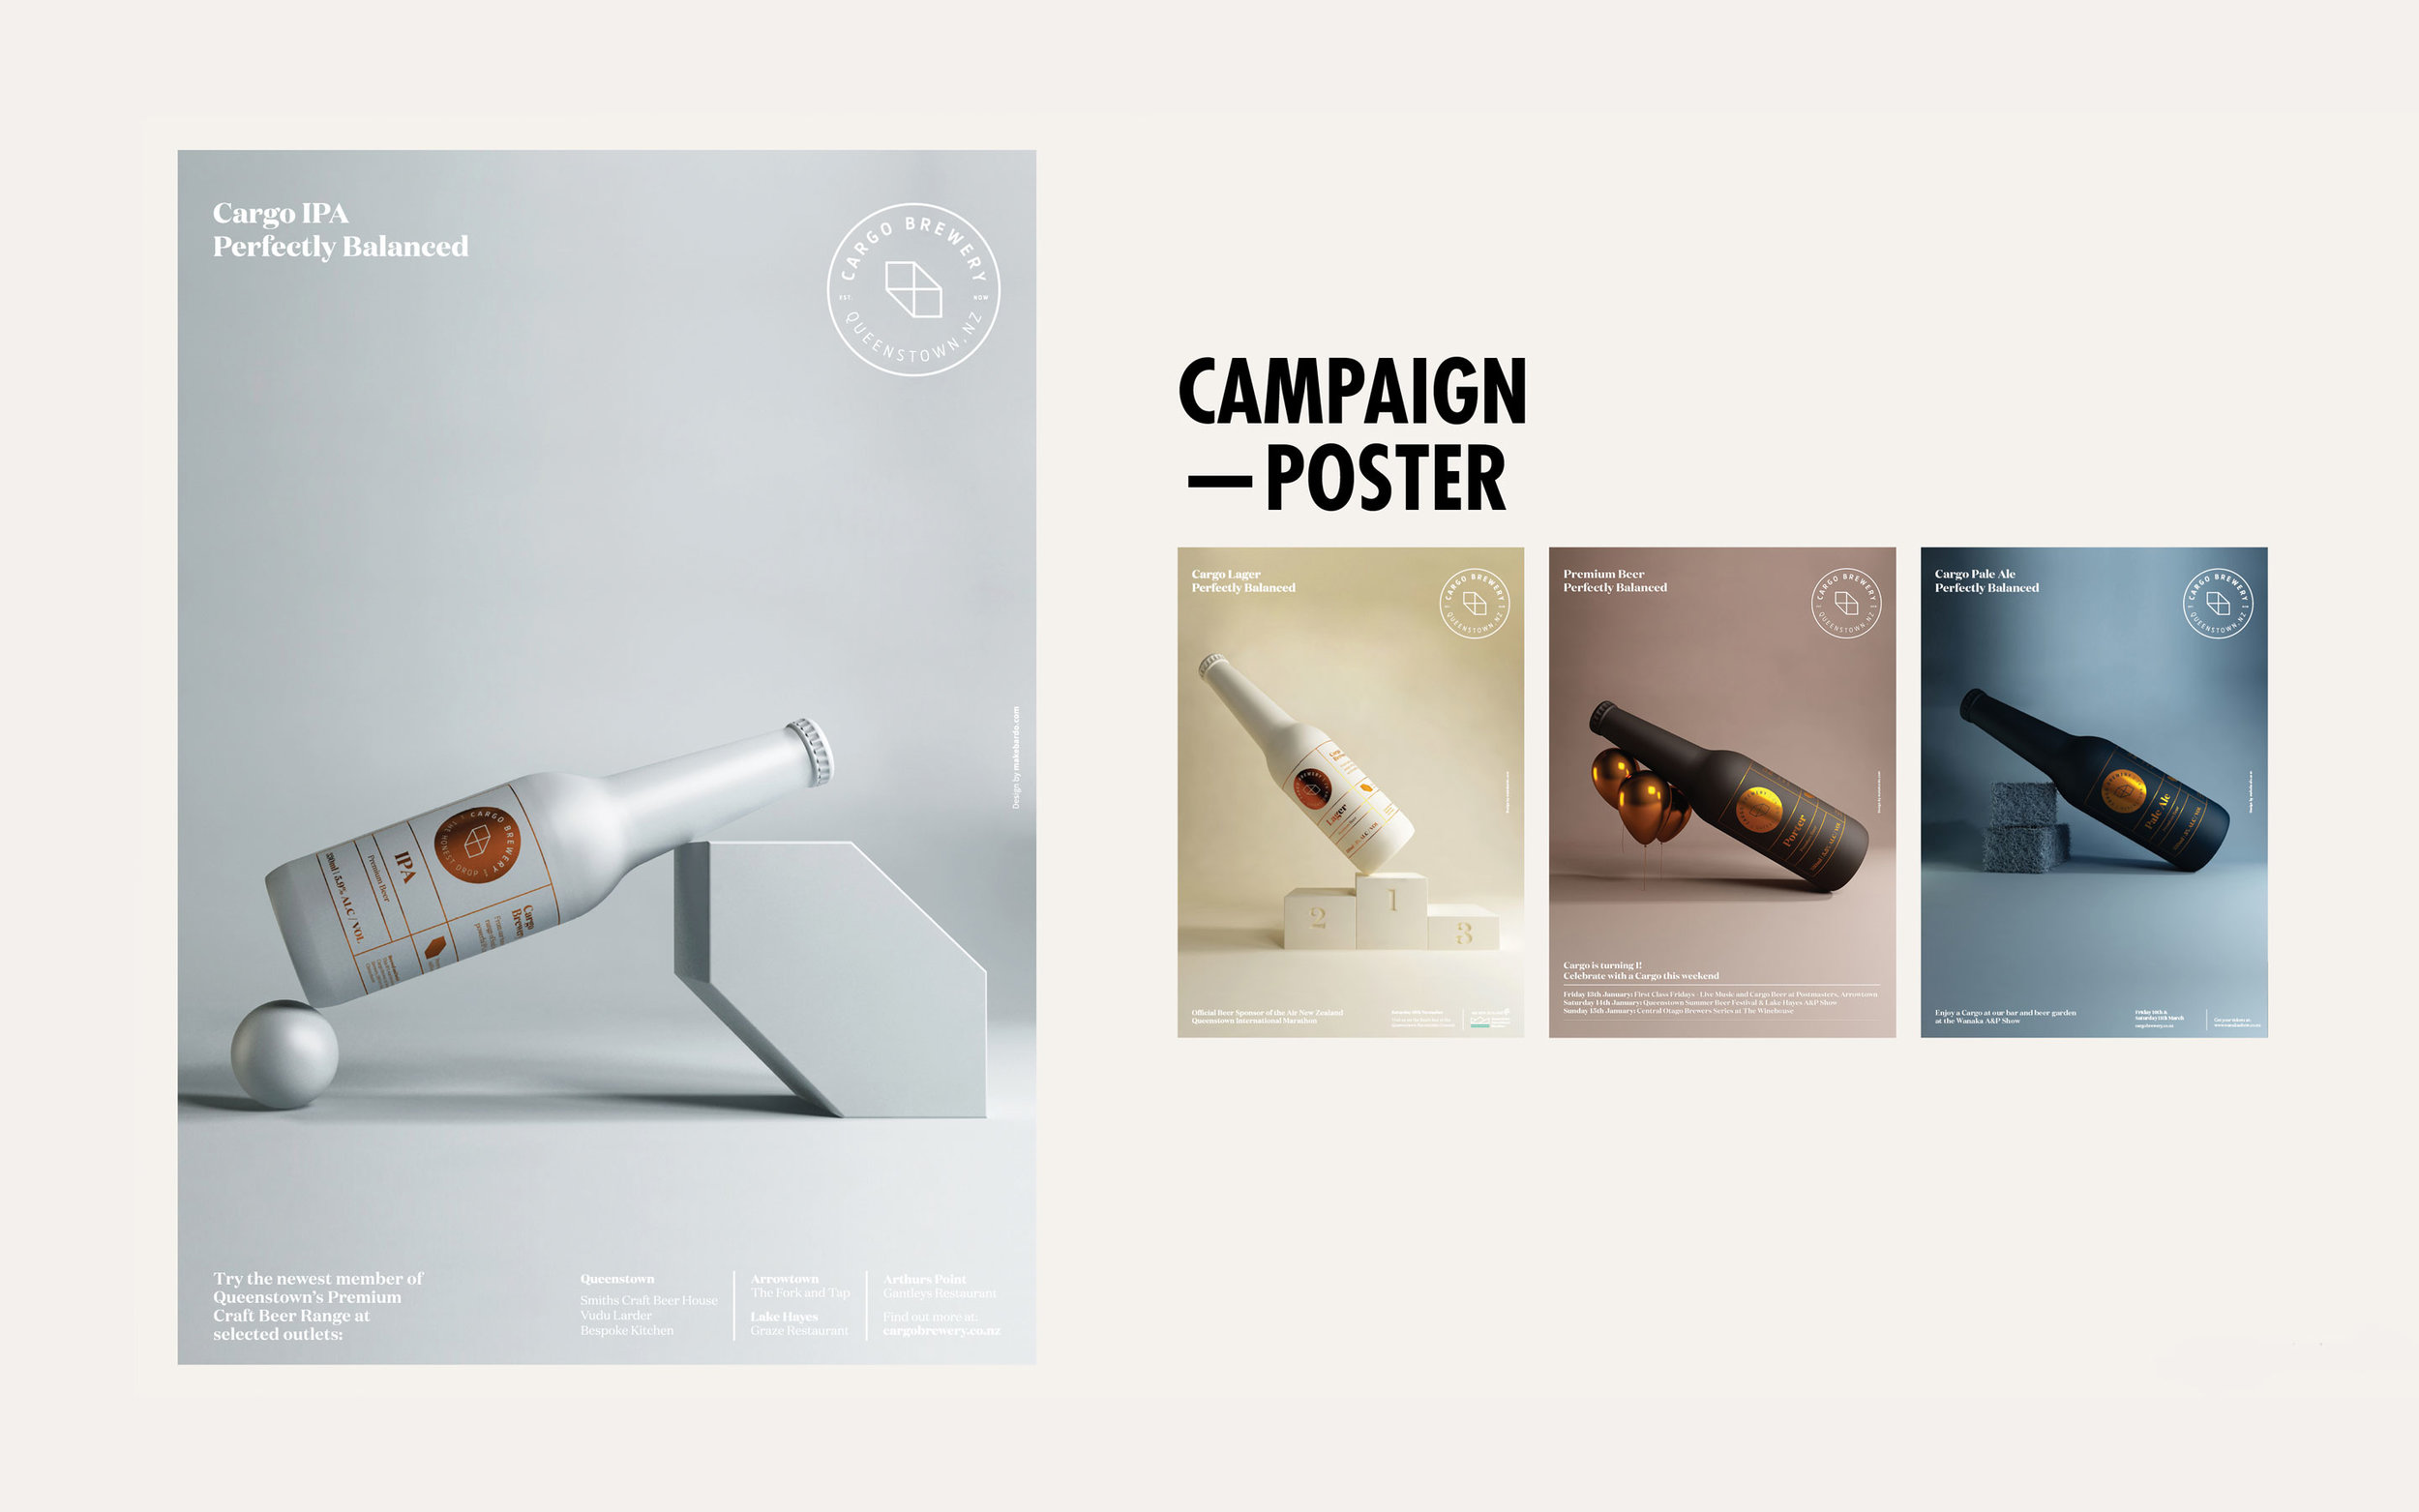 makebardo_cargobrewery_posters.jpg